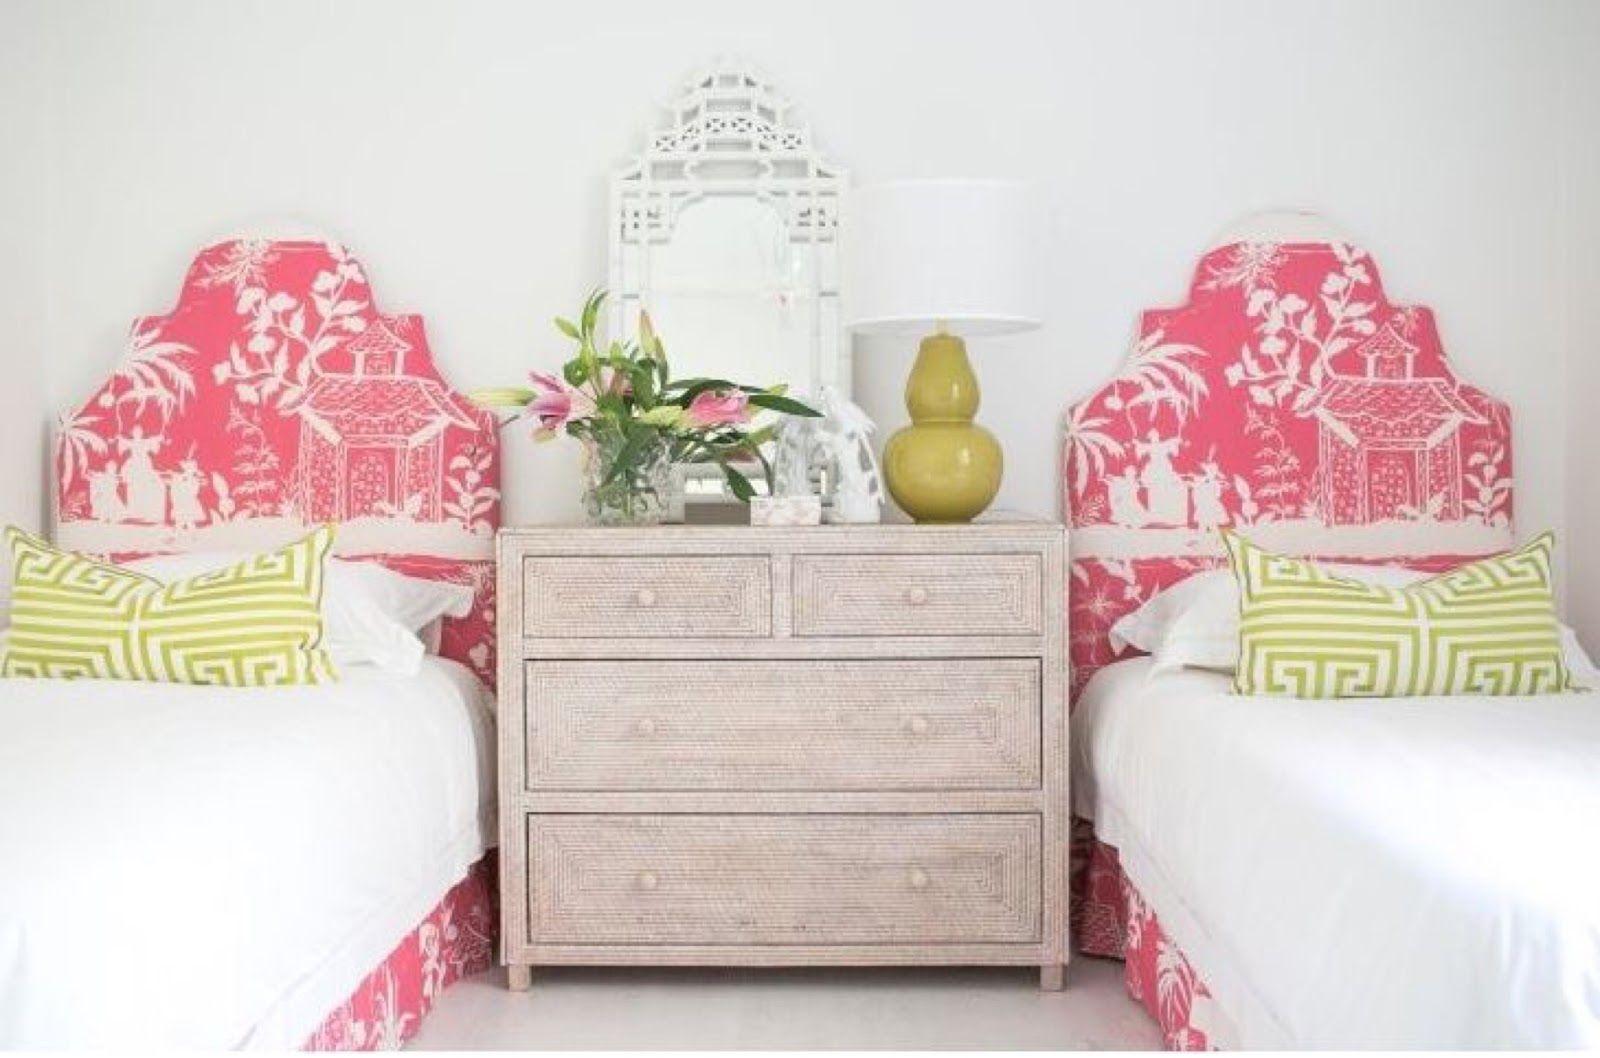 Palm Beach Home Habitacion Doble Para Ninas Decoracion Dormitorios Decoracion Hogar